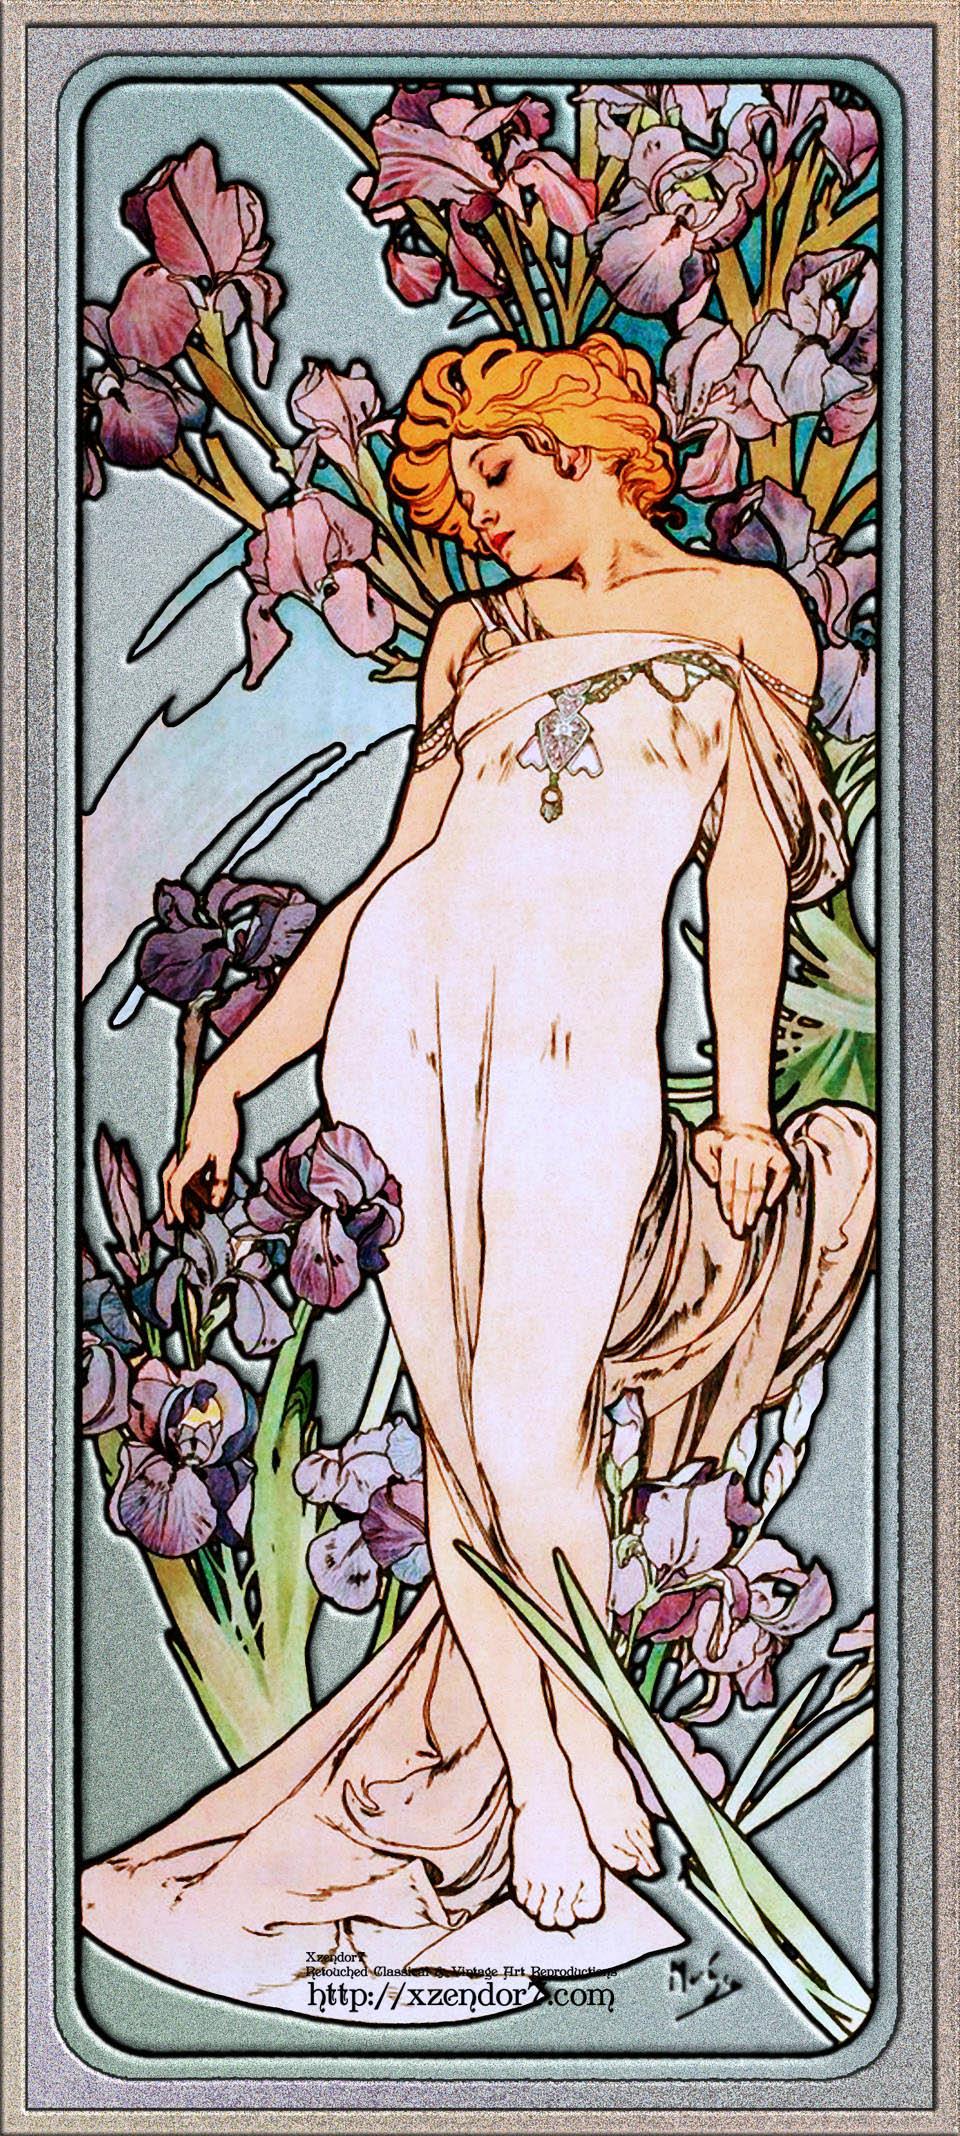 The Iris by Alphonse Mucha